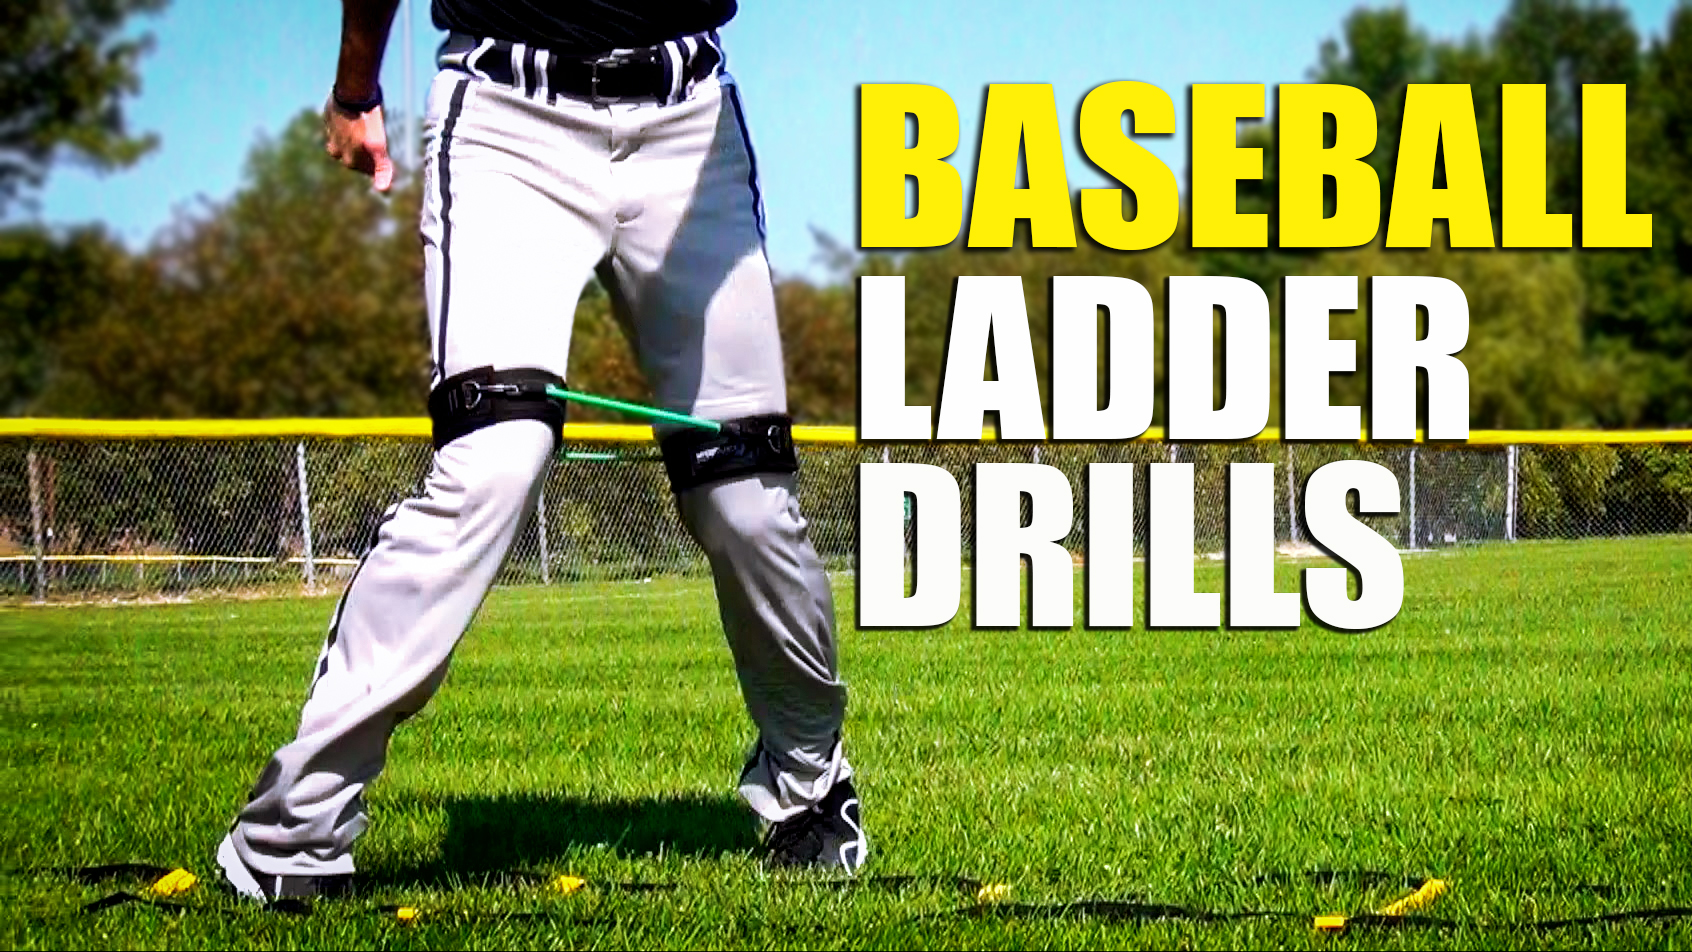 baseball-ladder-drills.jpg